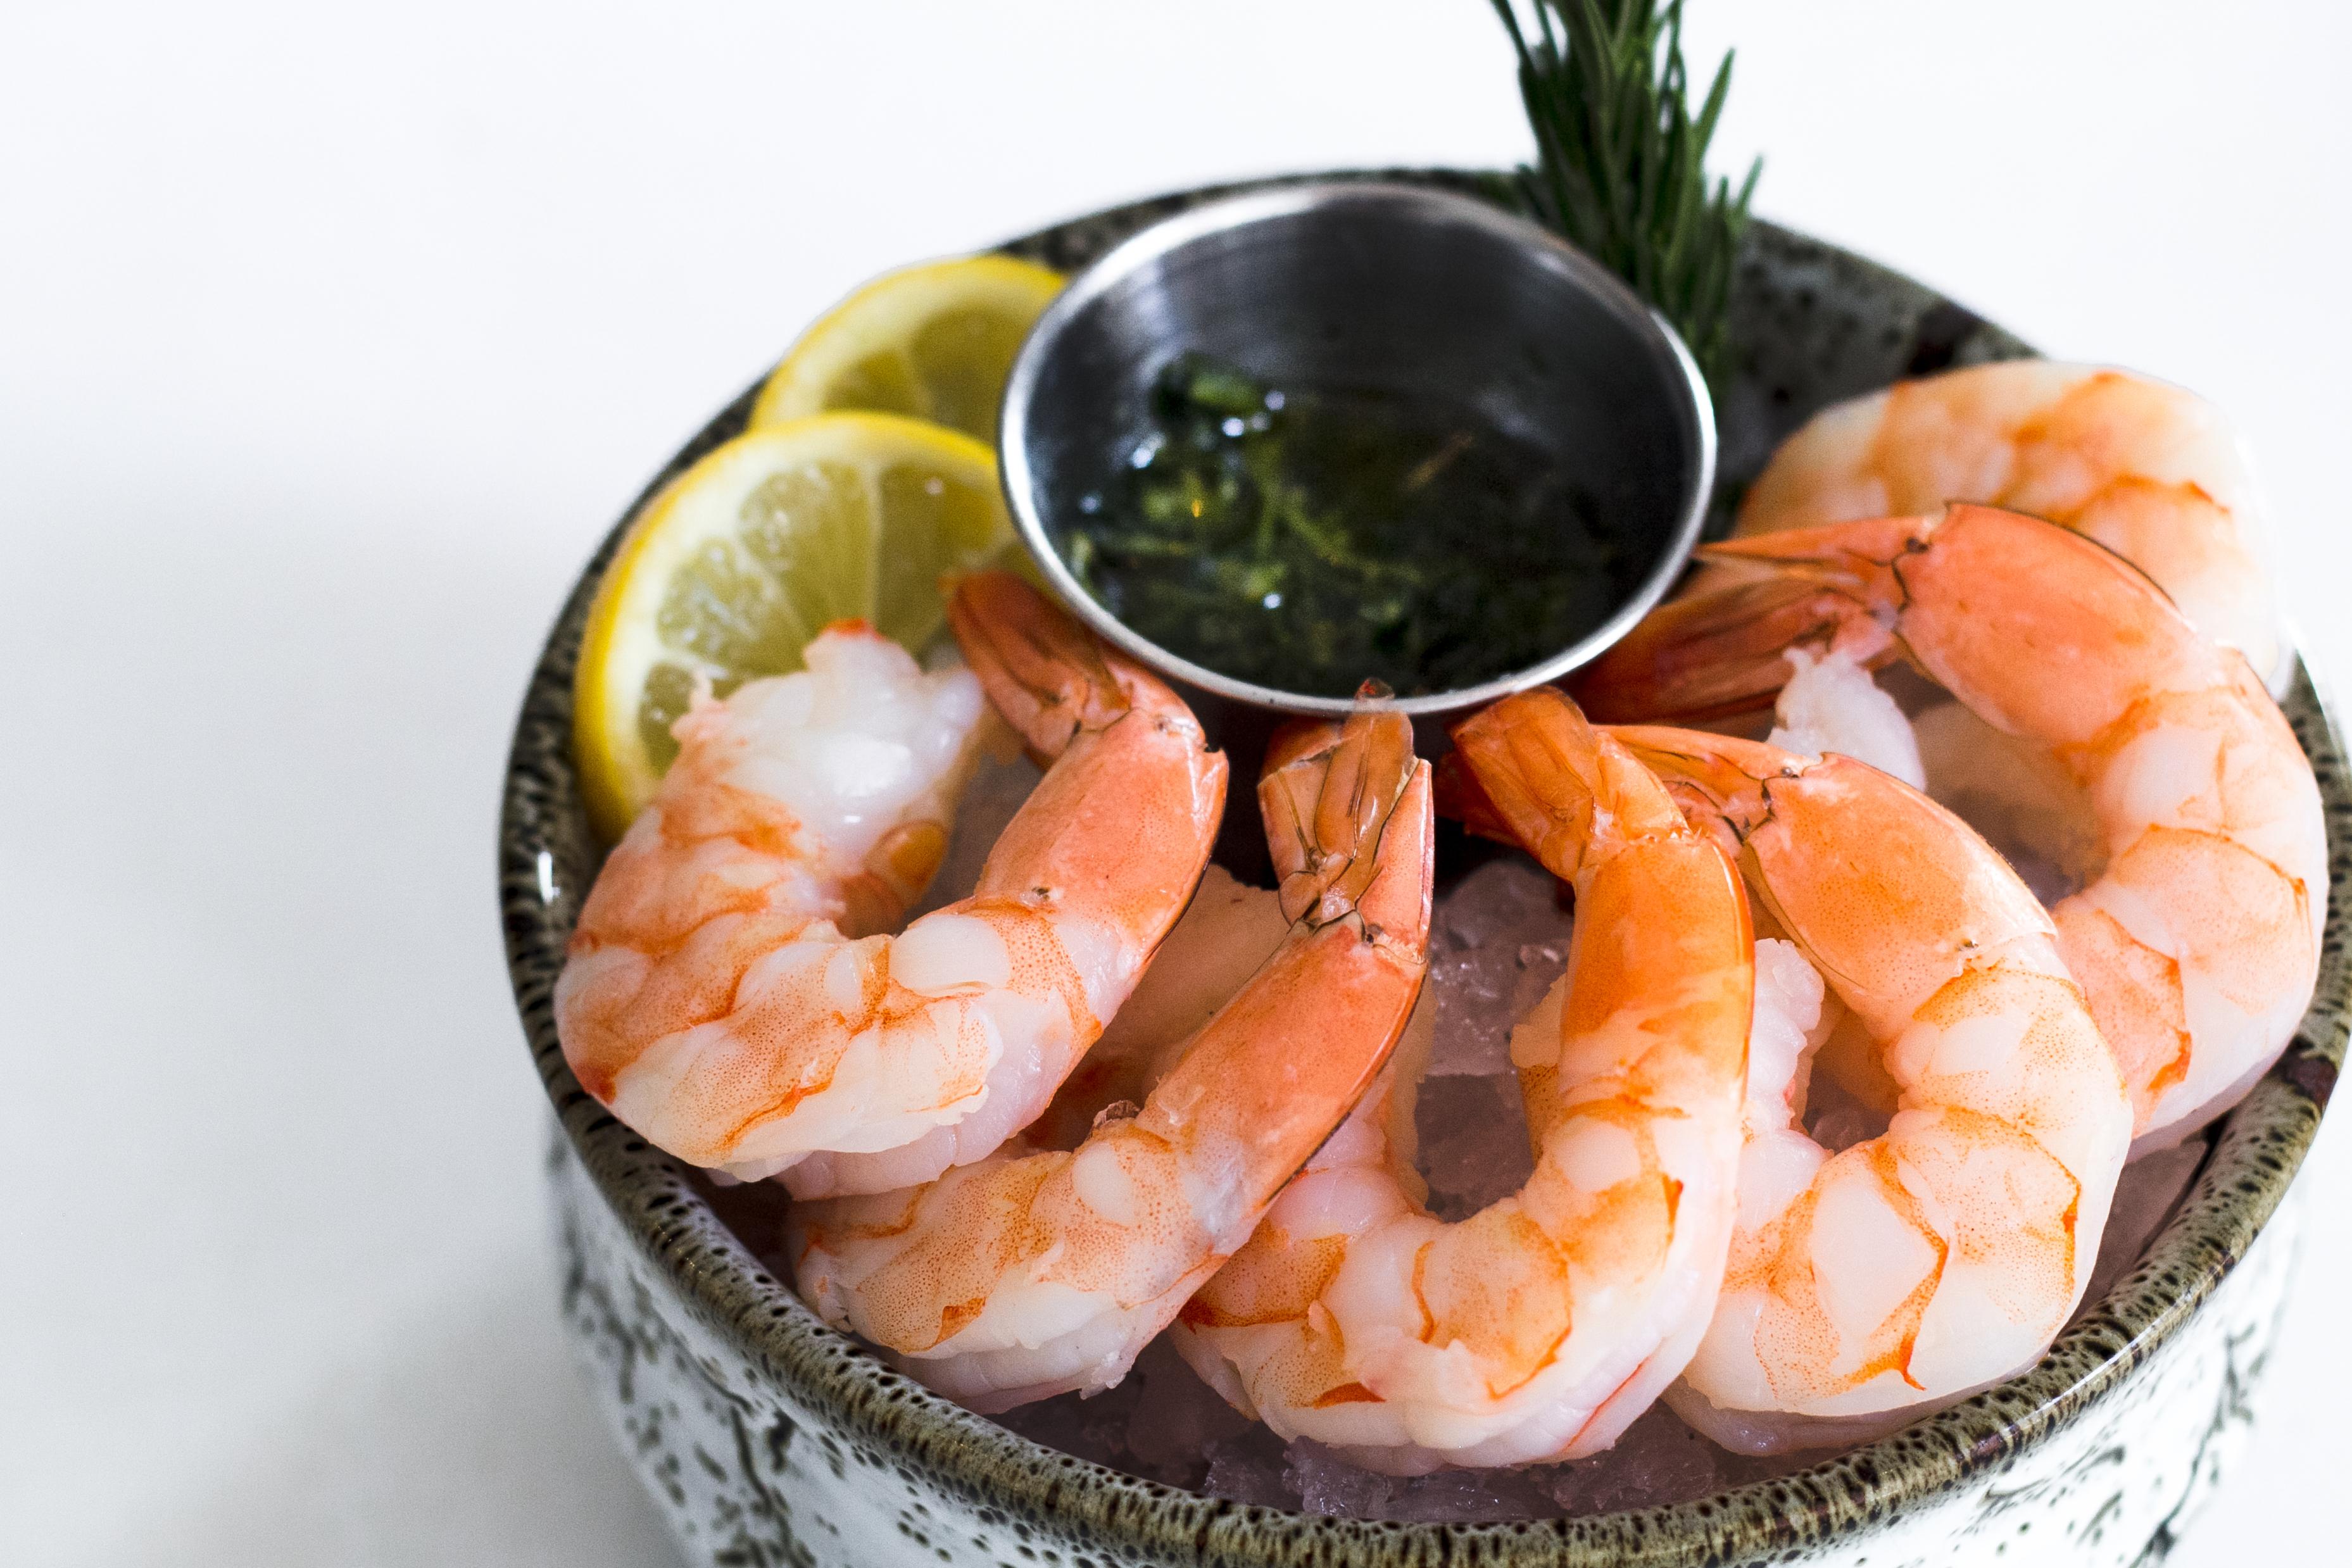 Miku Toronto's new recipe for National Shrimp Day May 9